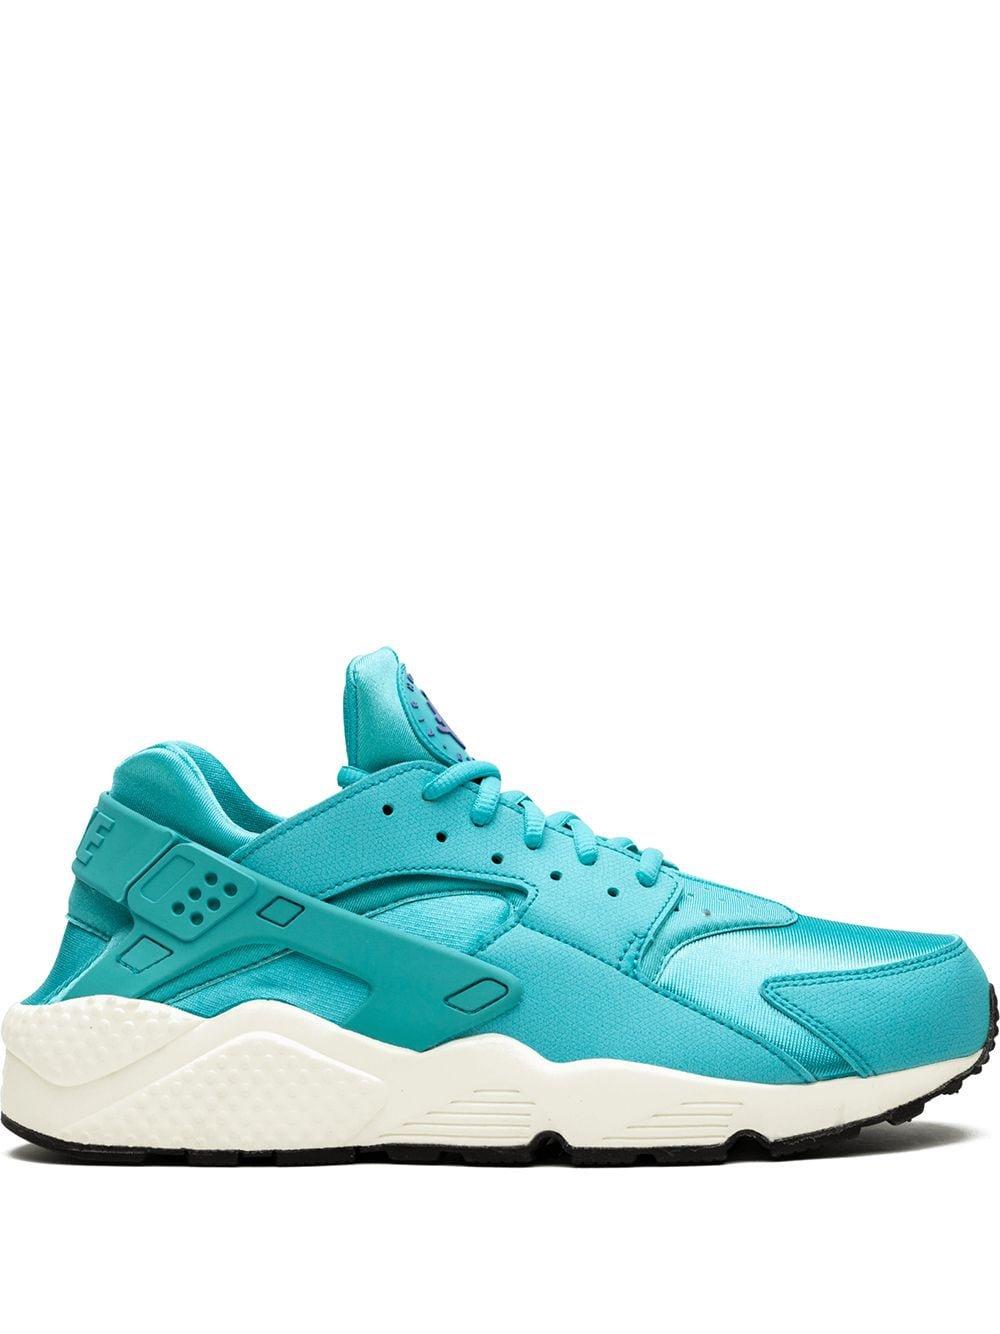 Nike Air Huarache Run Sneakers | Farfetch.com